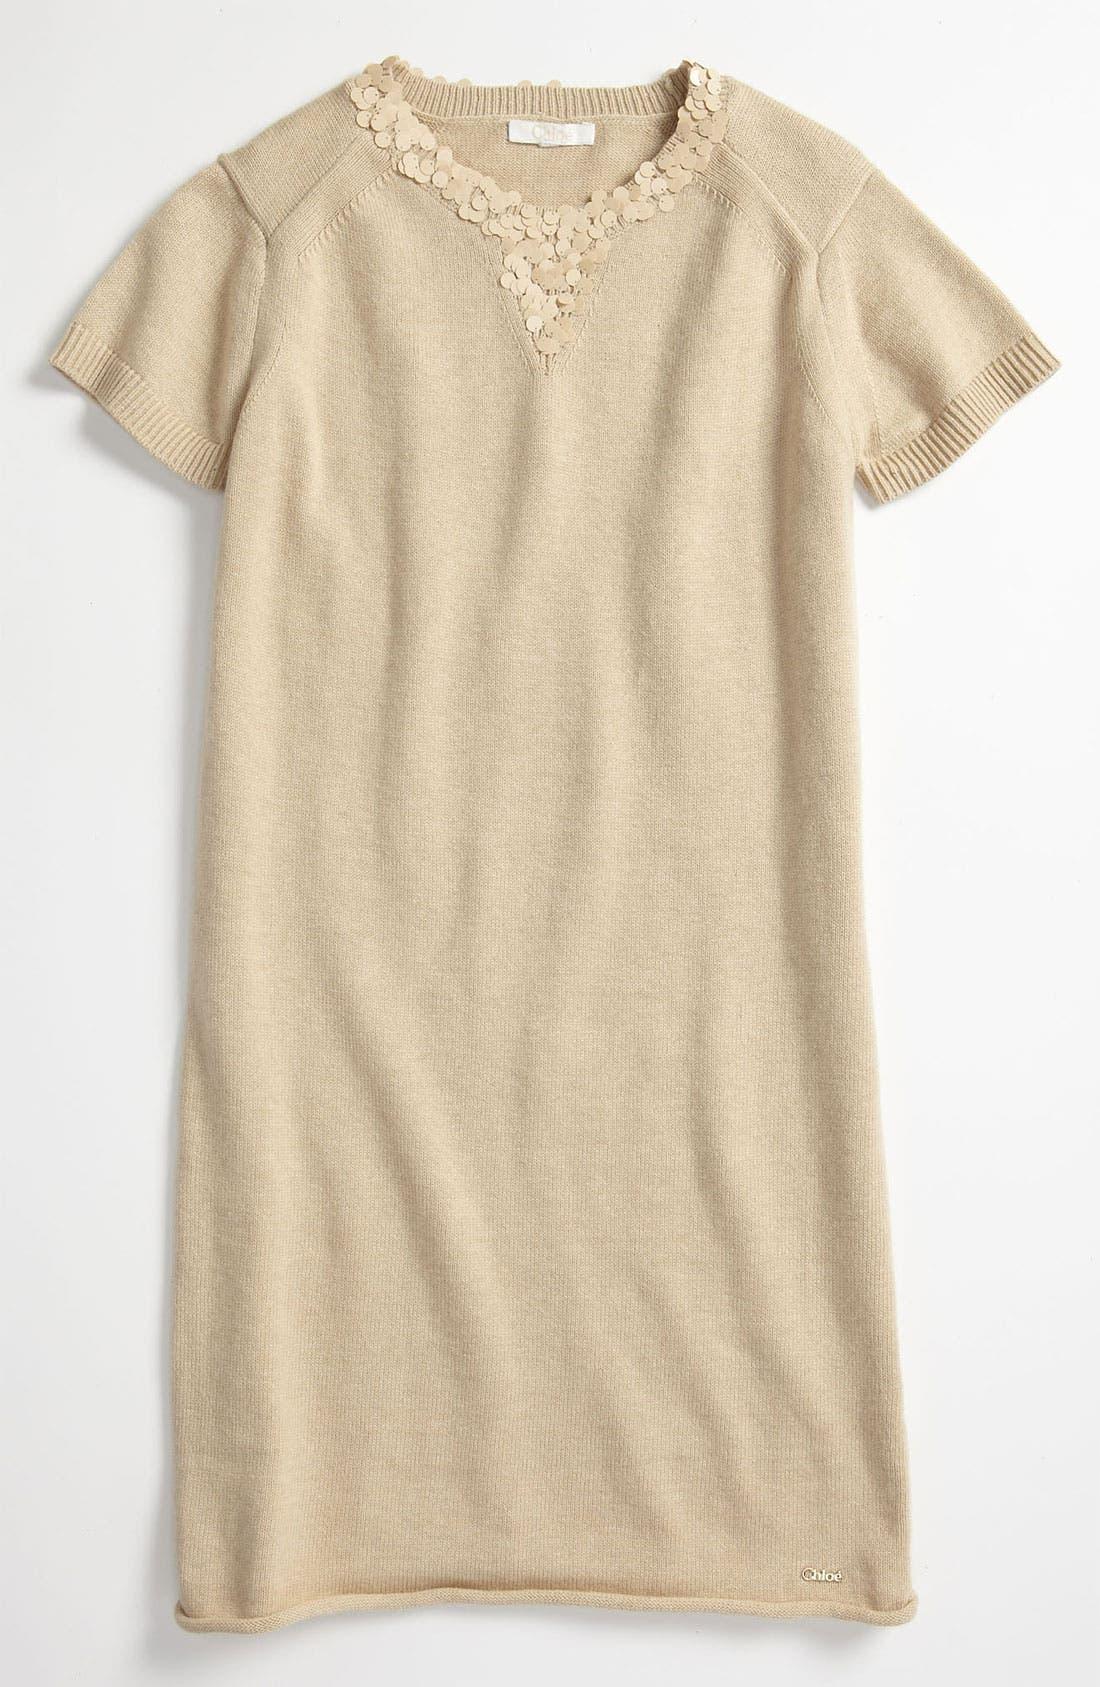 Alternate Image 1 Selected - Chloé Paillette Sweater Dress (Little Girls & Big Girls)